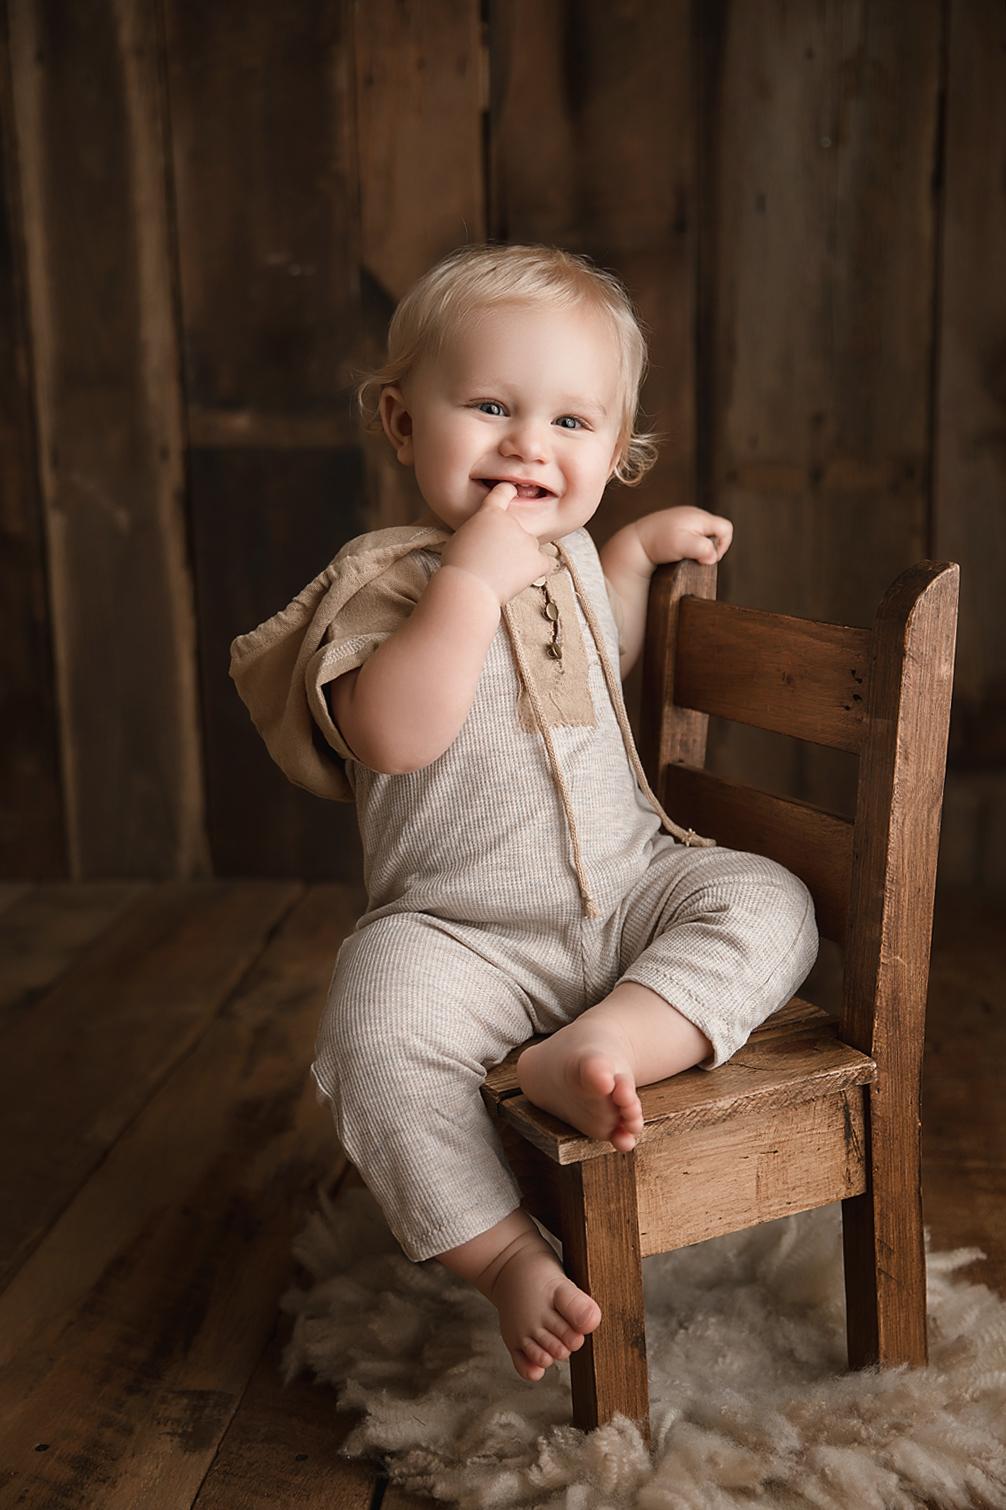 orange-county-baby-photography-studio-irvine-organic-natural-baby-boy.jpg